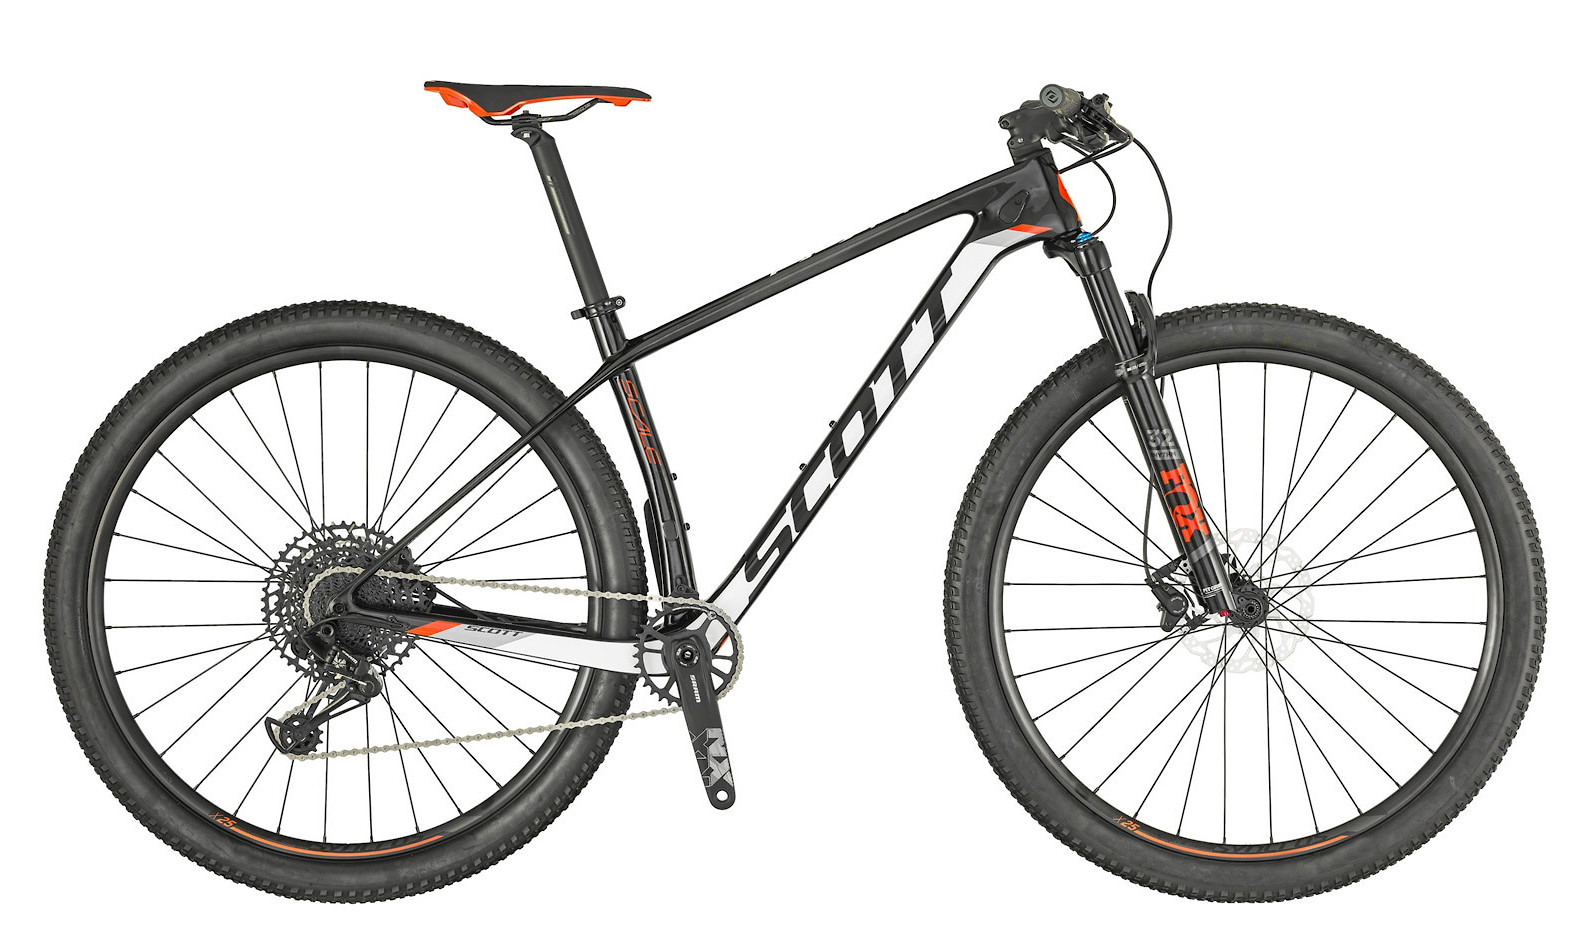 s1600_2019_Scott_Scale_930_Bike_1